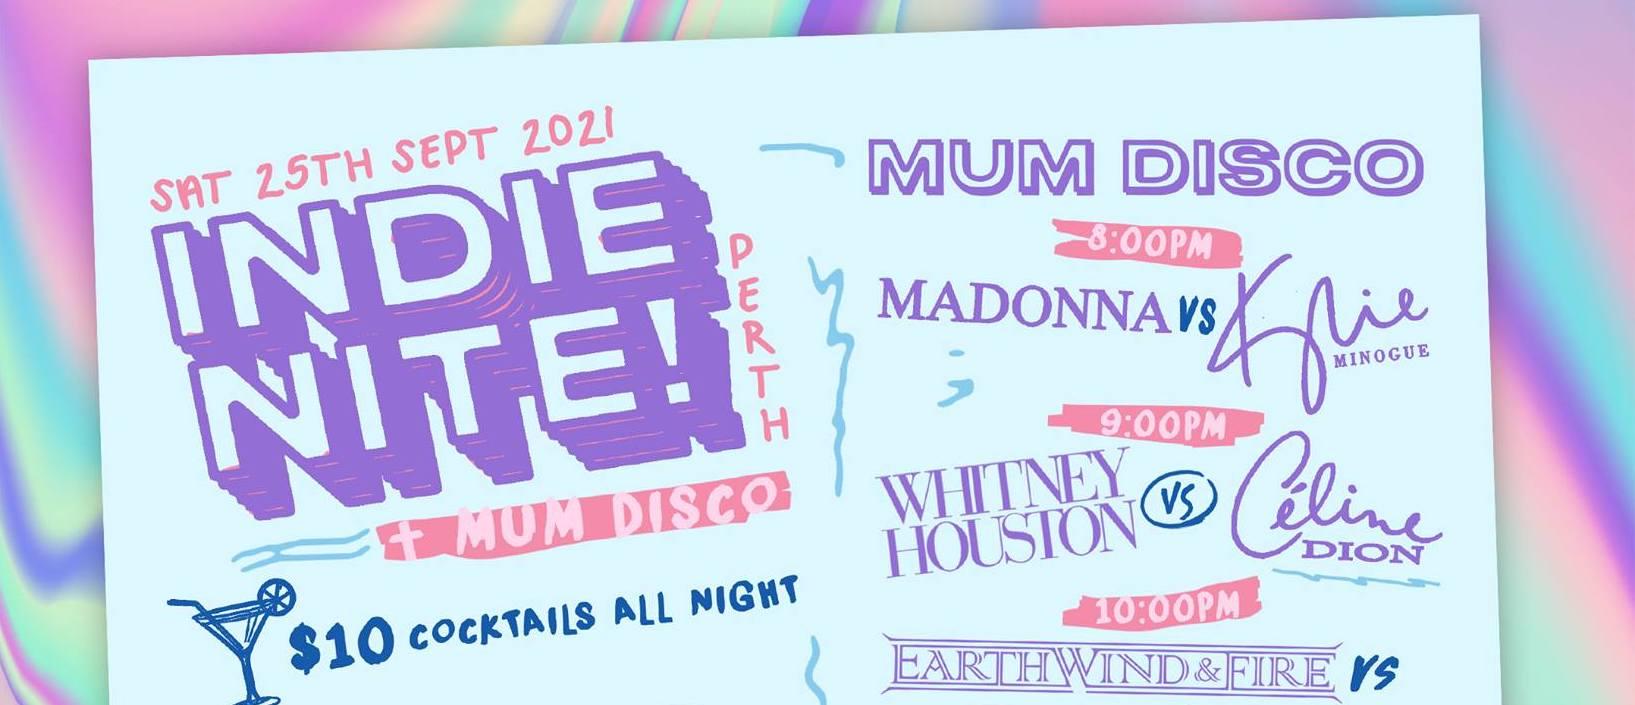 Indie Nite! + Mum disco